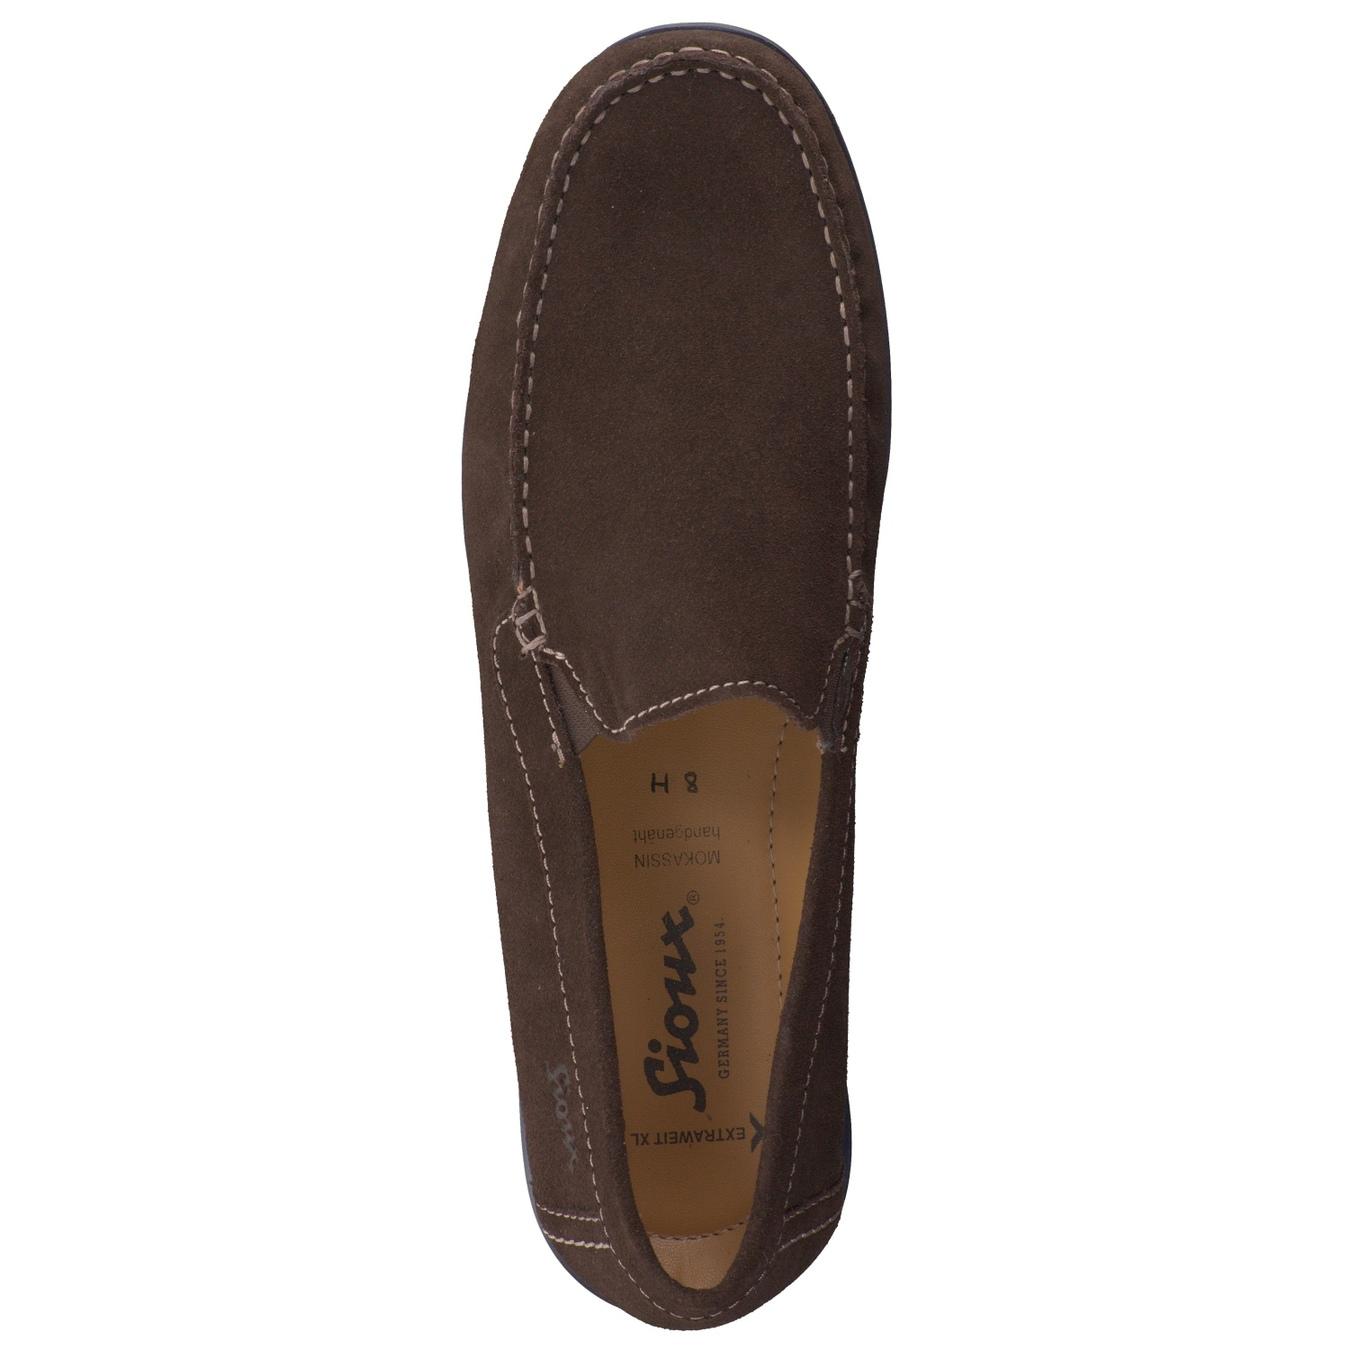 wholesale dealer fb0e3 5afaa Sioux Herren Slipper in dunkelbraun kaufen   Zumnorde Online-Shop